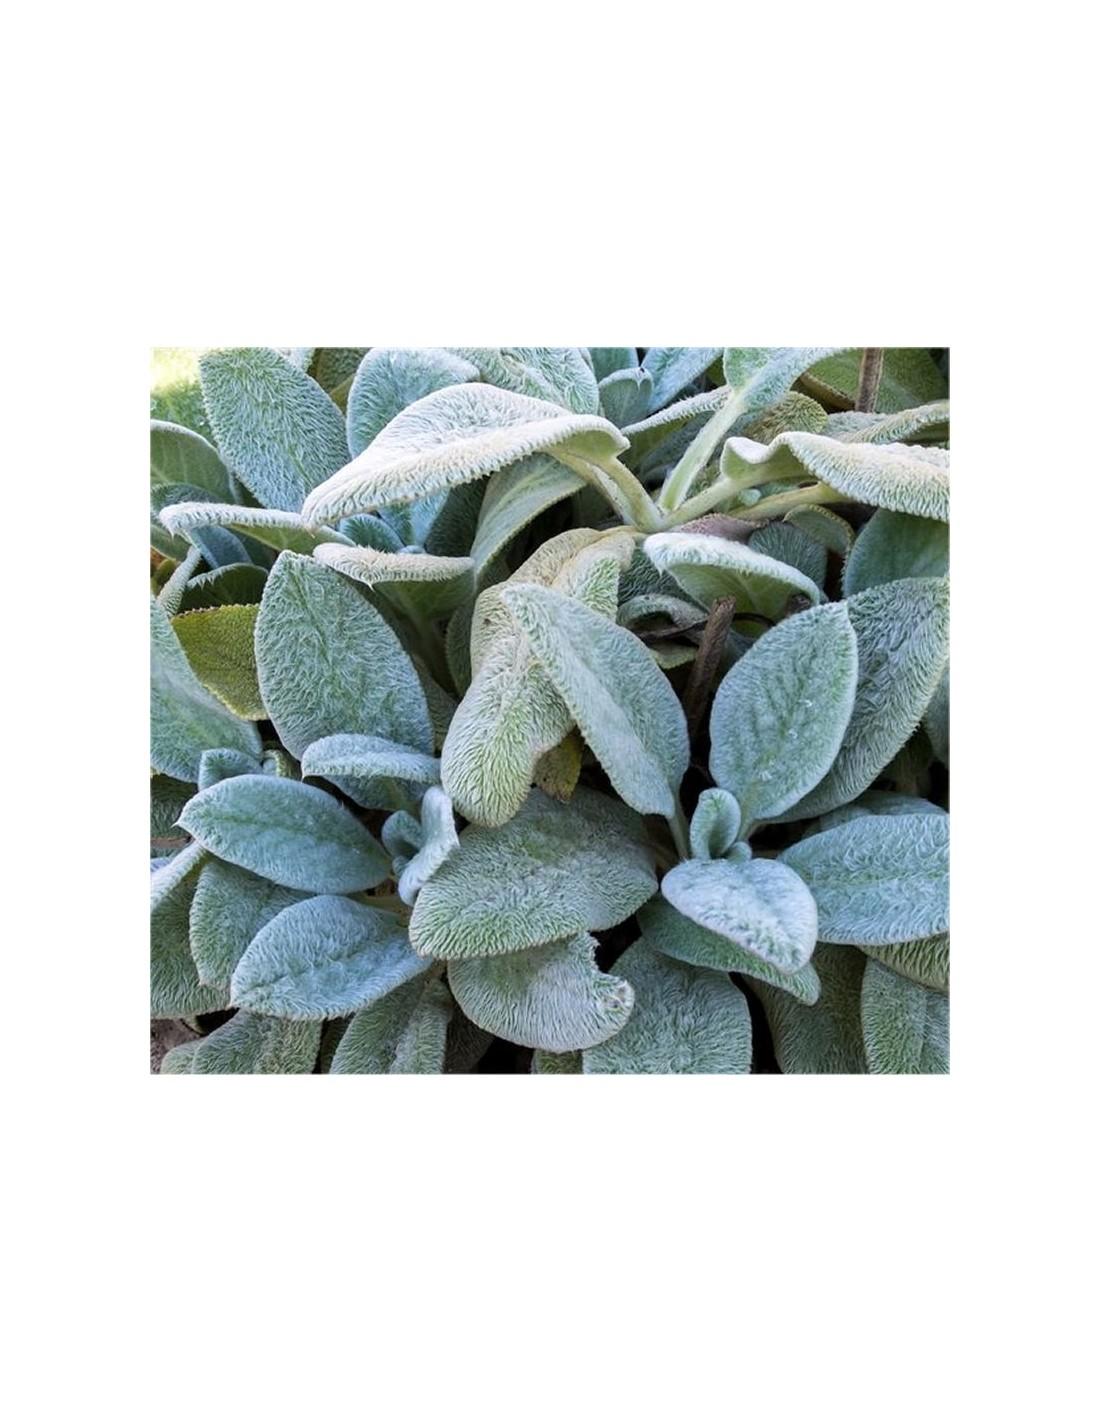 Pianta Orecchie Di Agnello stachys plant for sale - bush plants online | mondo piante